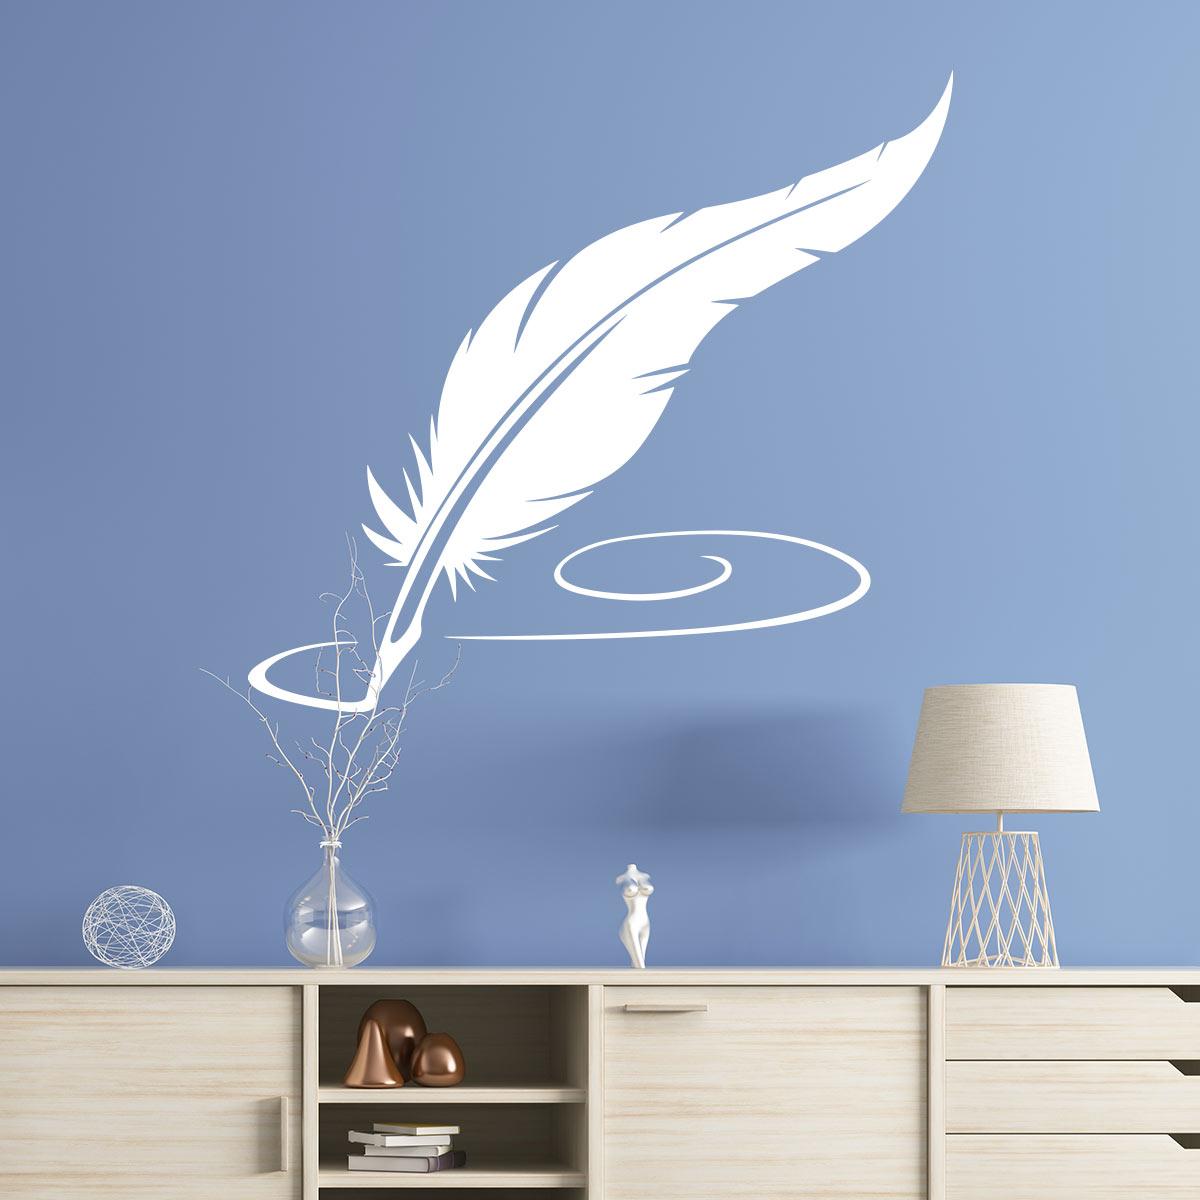 sticker la plume de l 39 crivain stickers art et design artistiques ambiance sticker. Black Bedroom Furniture Sets. Home Design Ideas